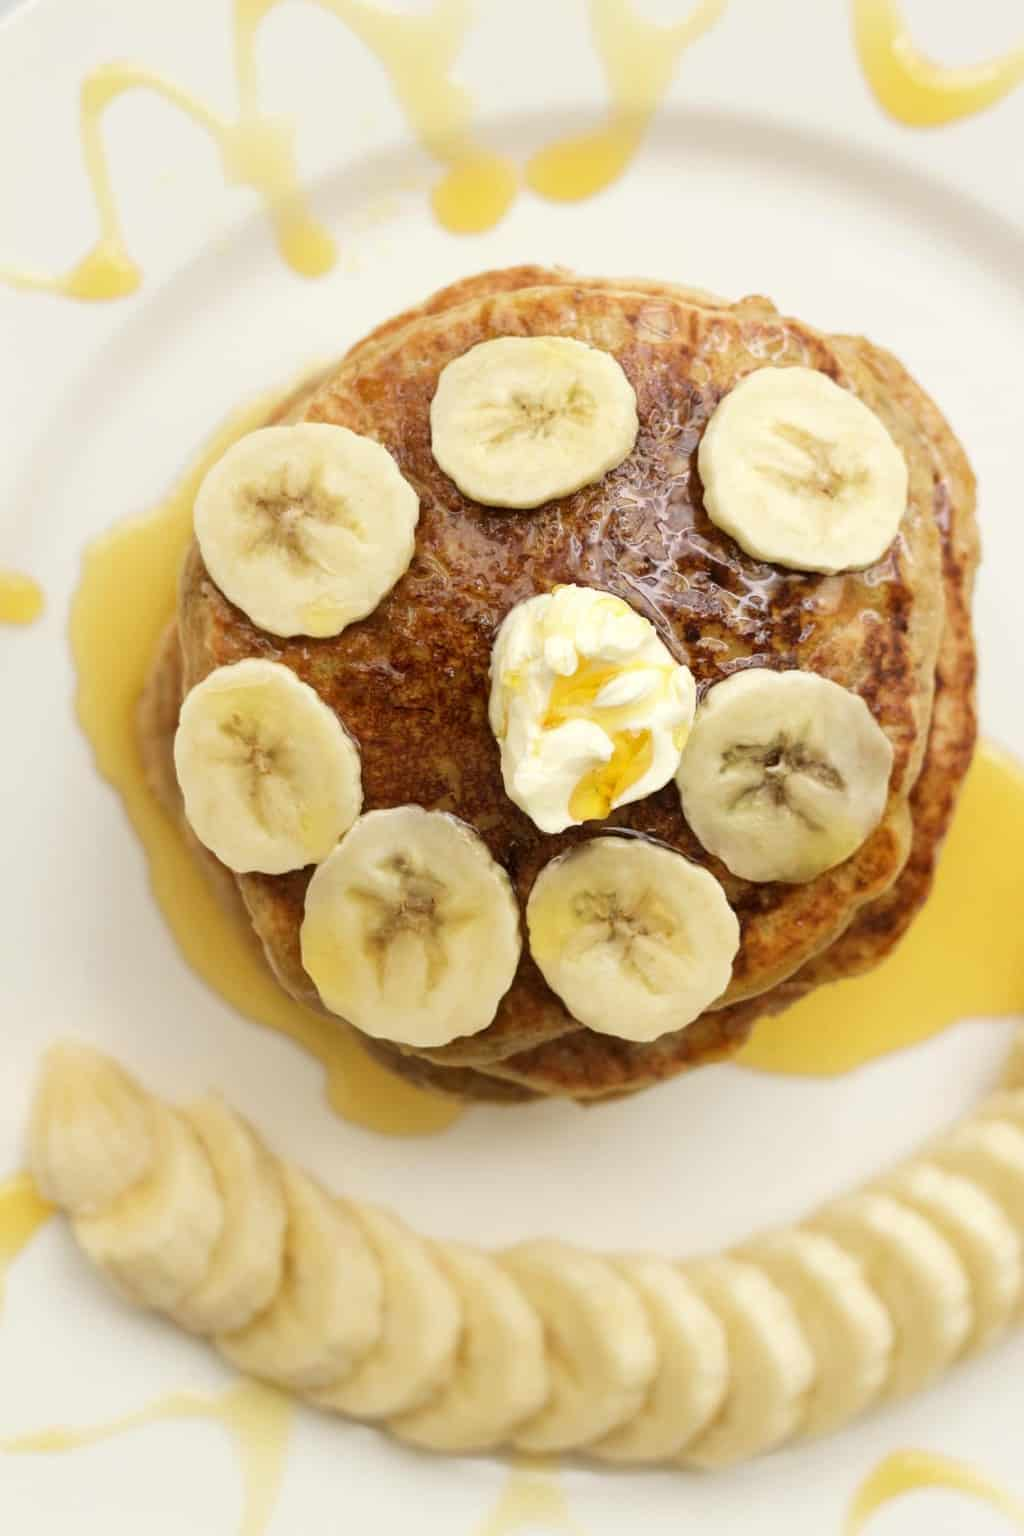 Gluten Free Vanilla Protein Pancakes #gluten-free #dairy-free #vegan #lovingitvegan